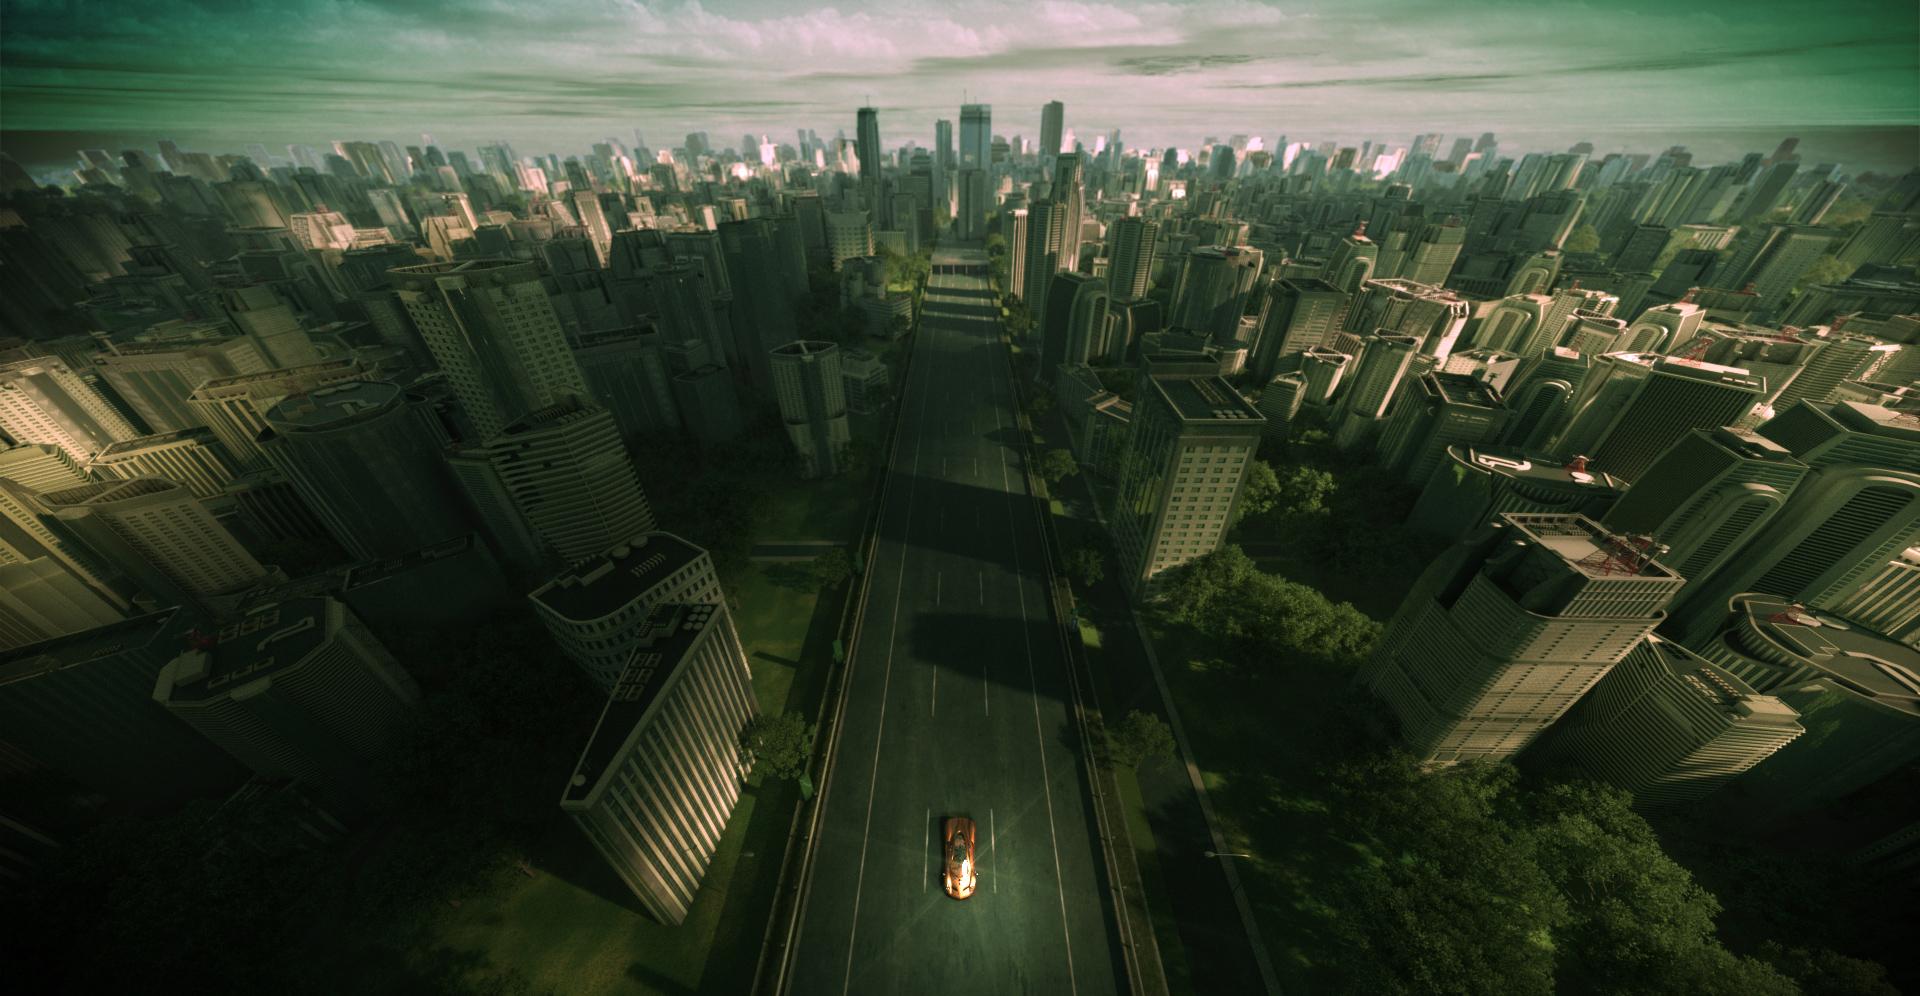 City A 2